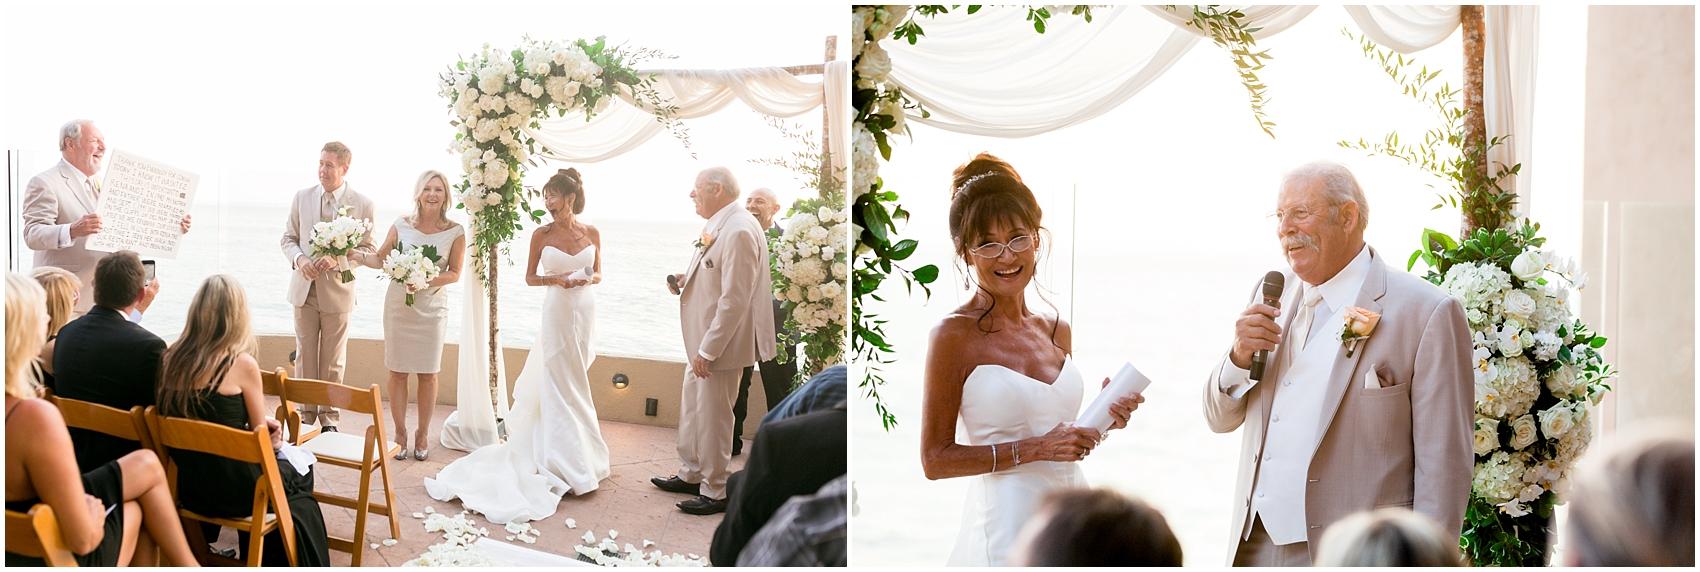 Rena and Louis_ Wedding-0435.jpg